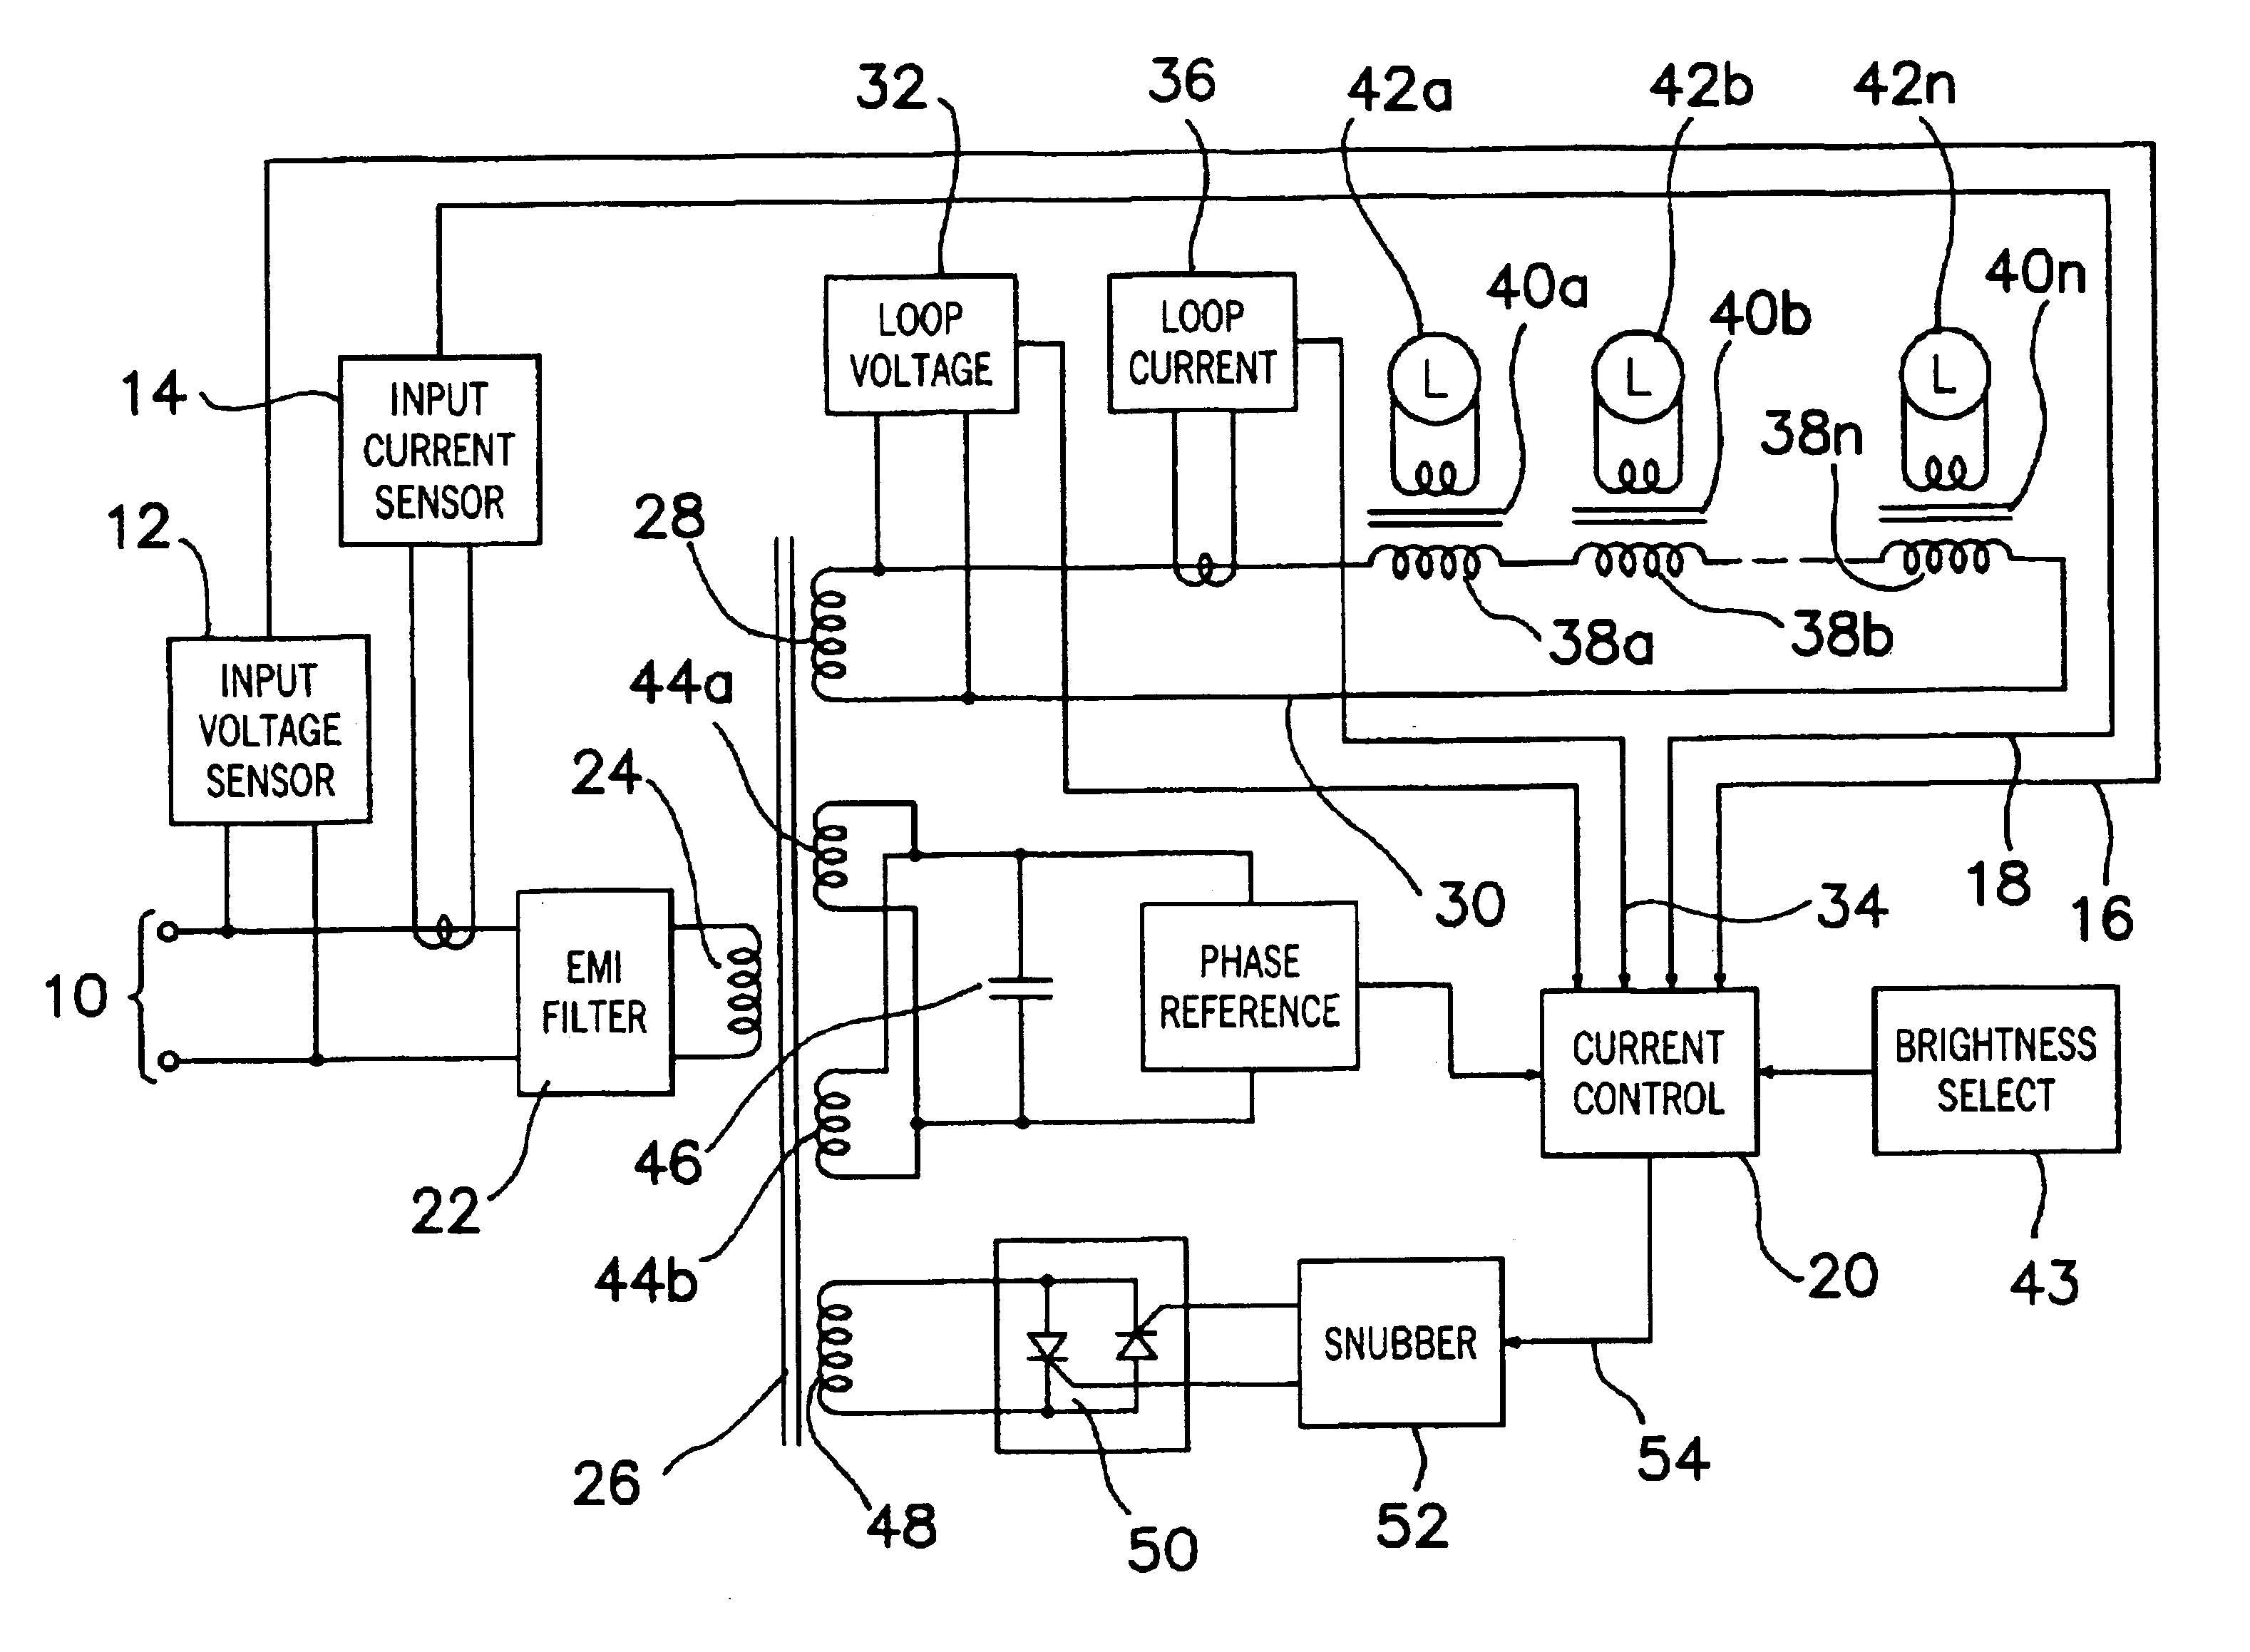 Airport Lighting Circuit Diagrams - Block And Schematic Diagrams •